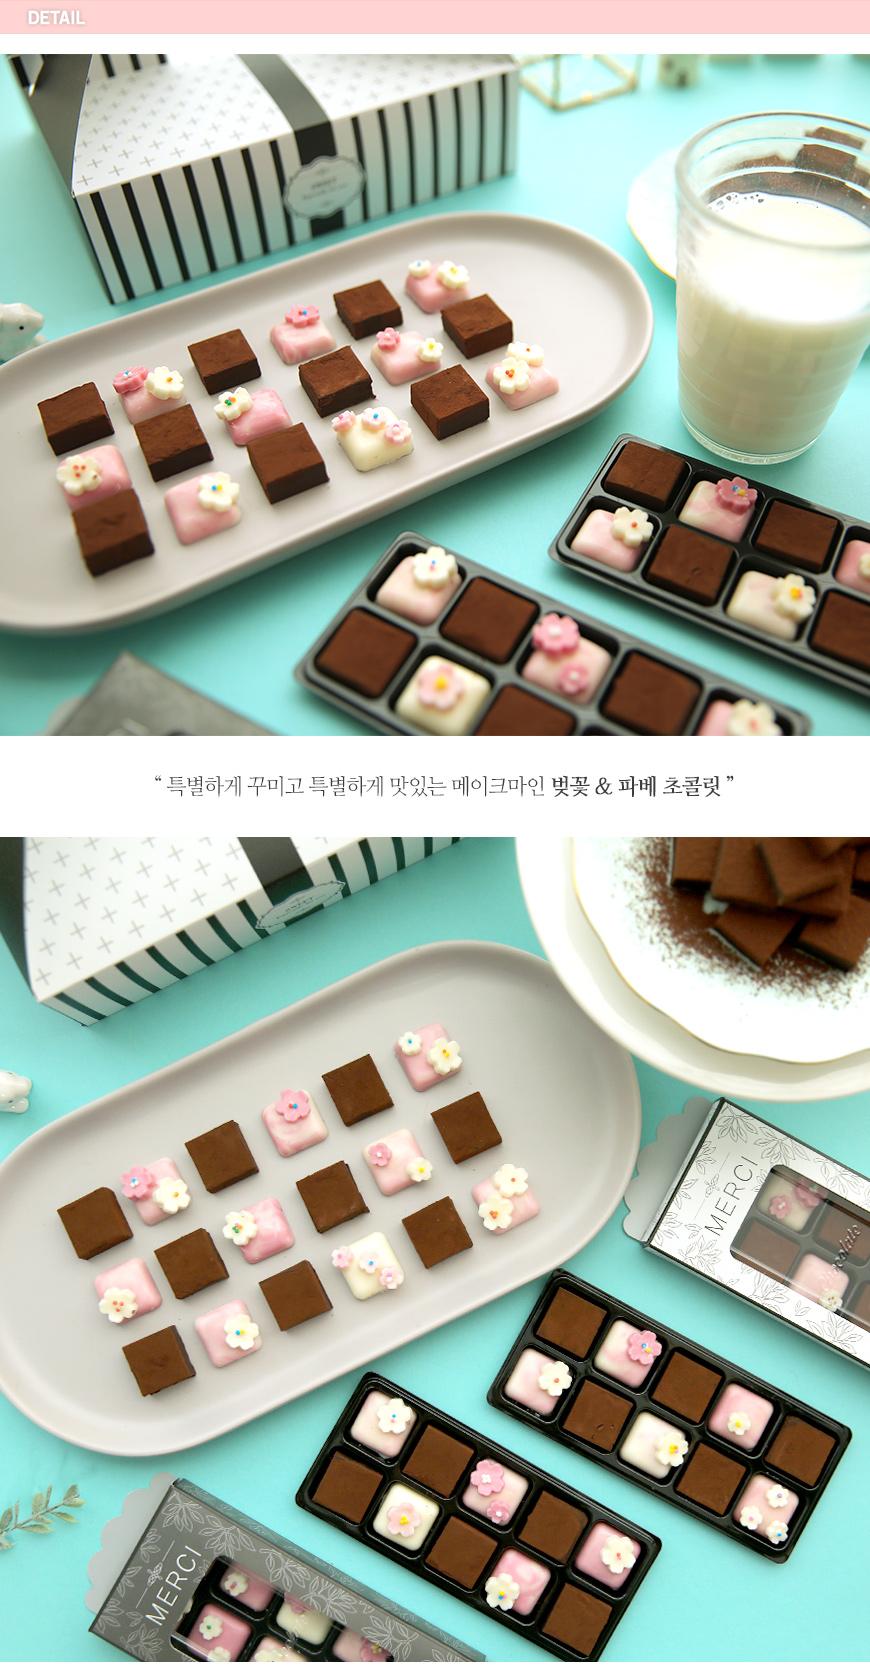 I 벚꽃블로썸 파베 초콜릿 만들기 세트 VER.2018 - 어반샵앤레시피, 24,800원, DIY세트, 초콜릿 만들기